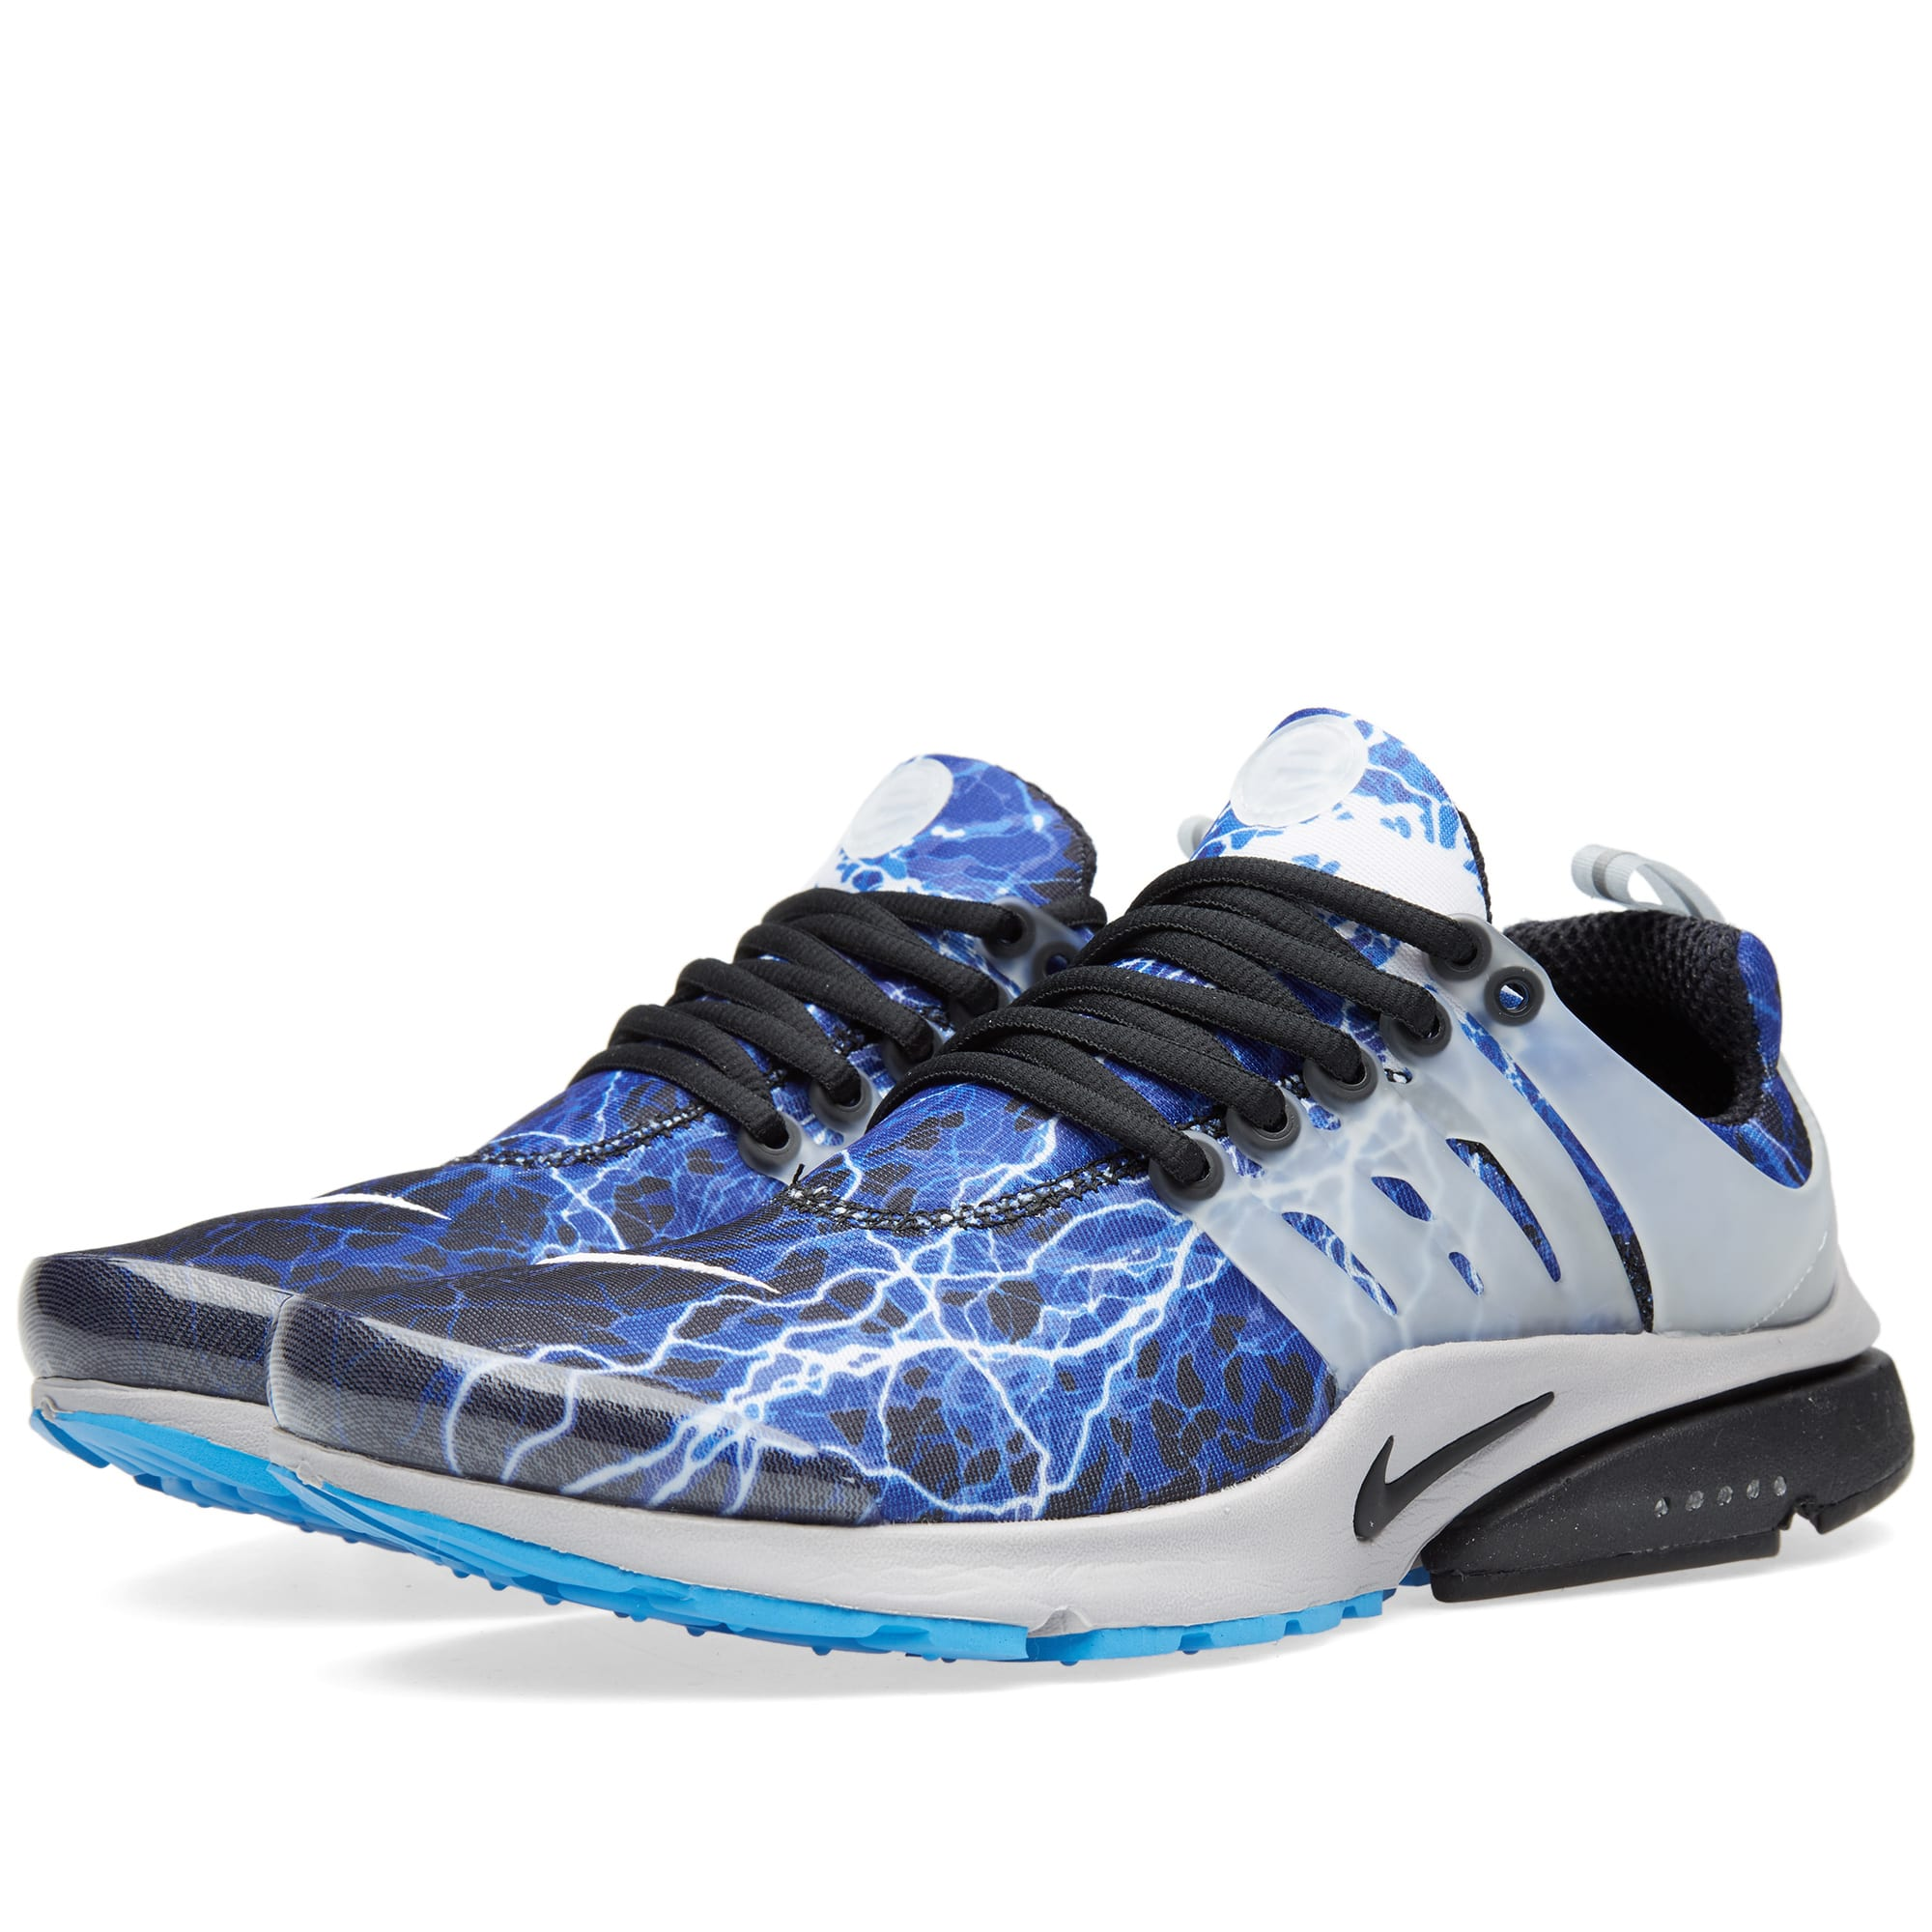 Nike Air Presto QS 'Lightning'